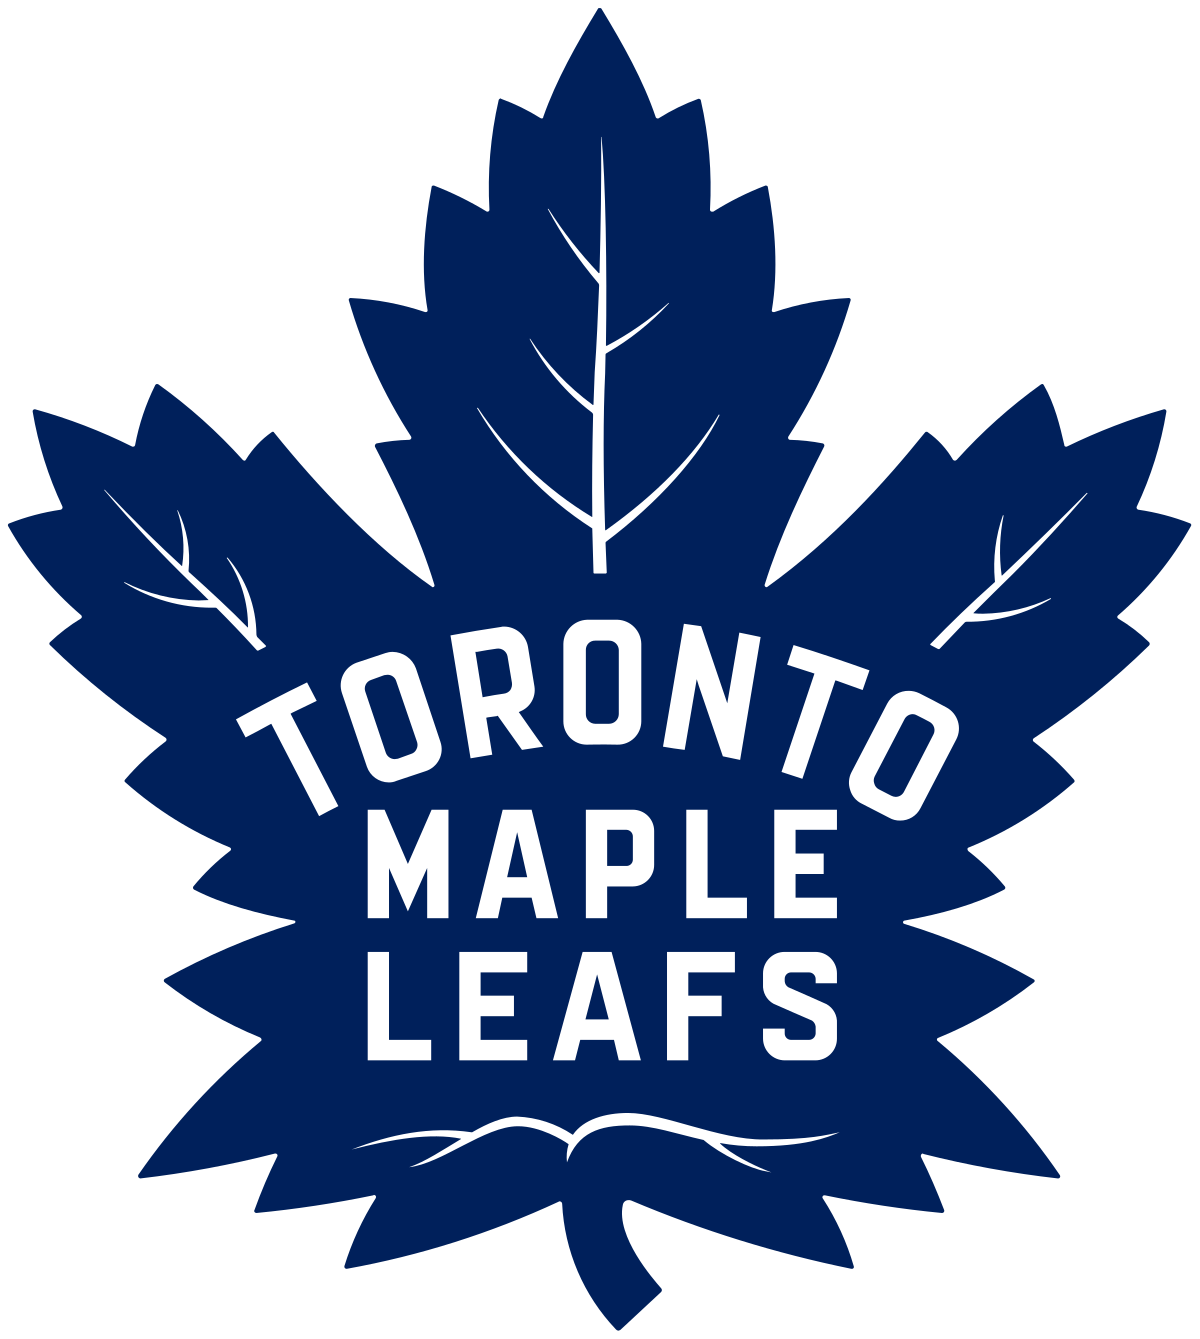 Toronto Maple Leafs.